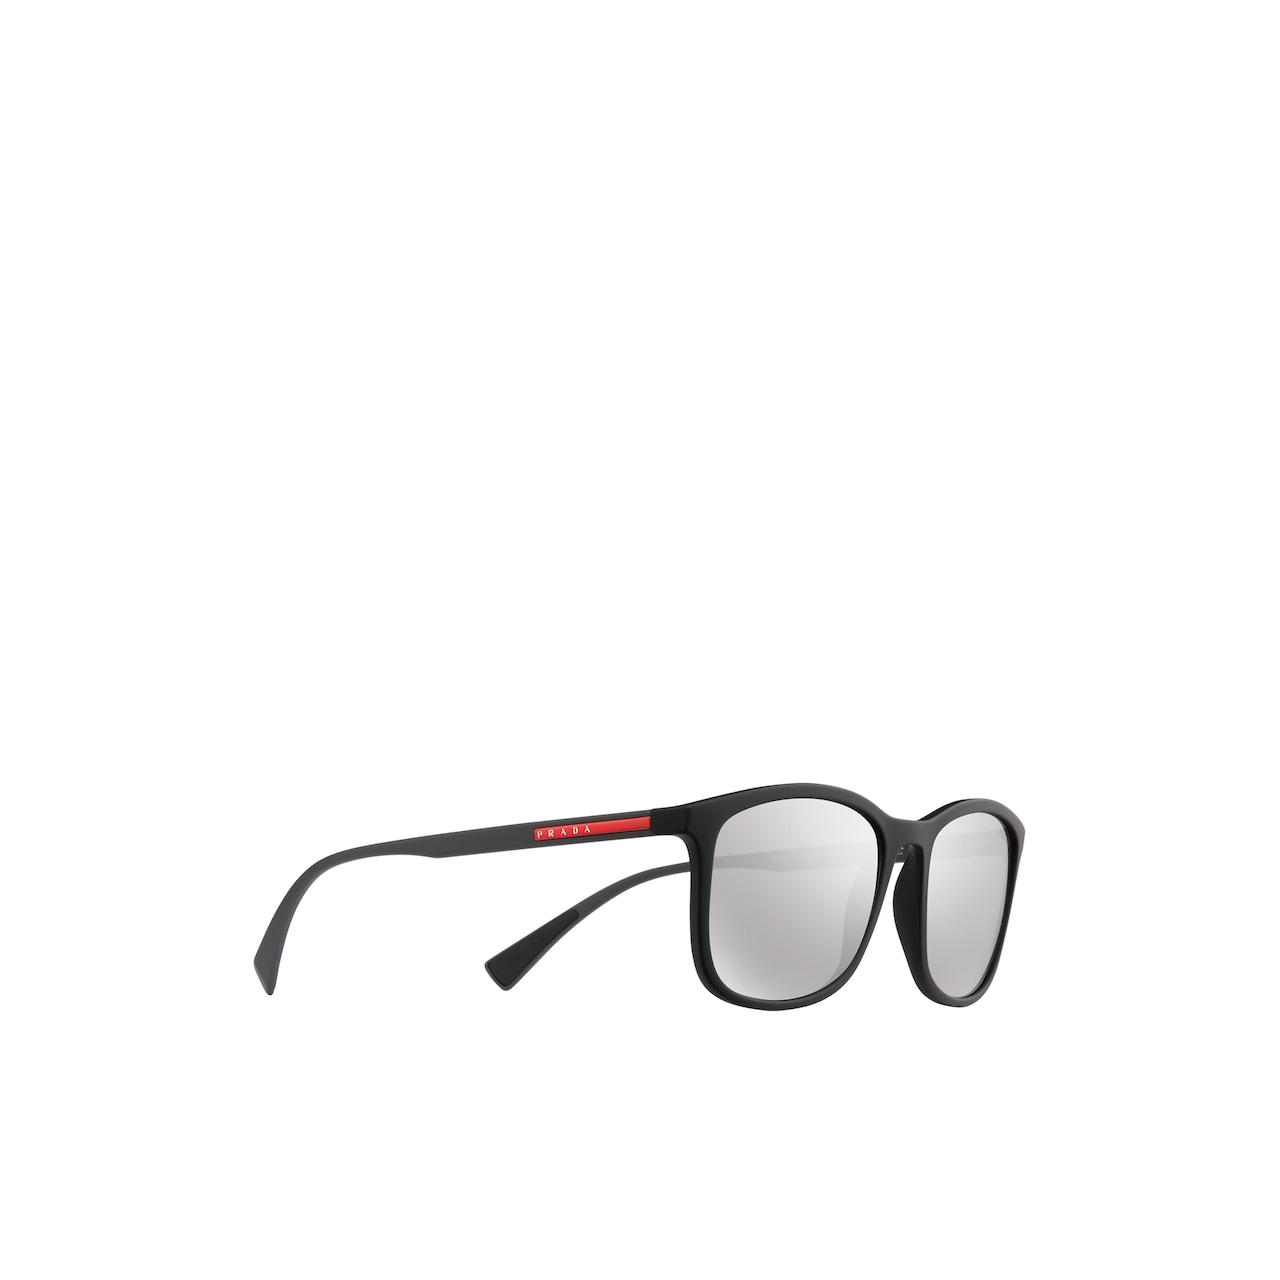 Prada Linea Rossa Eyewear Collection